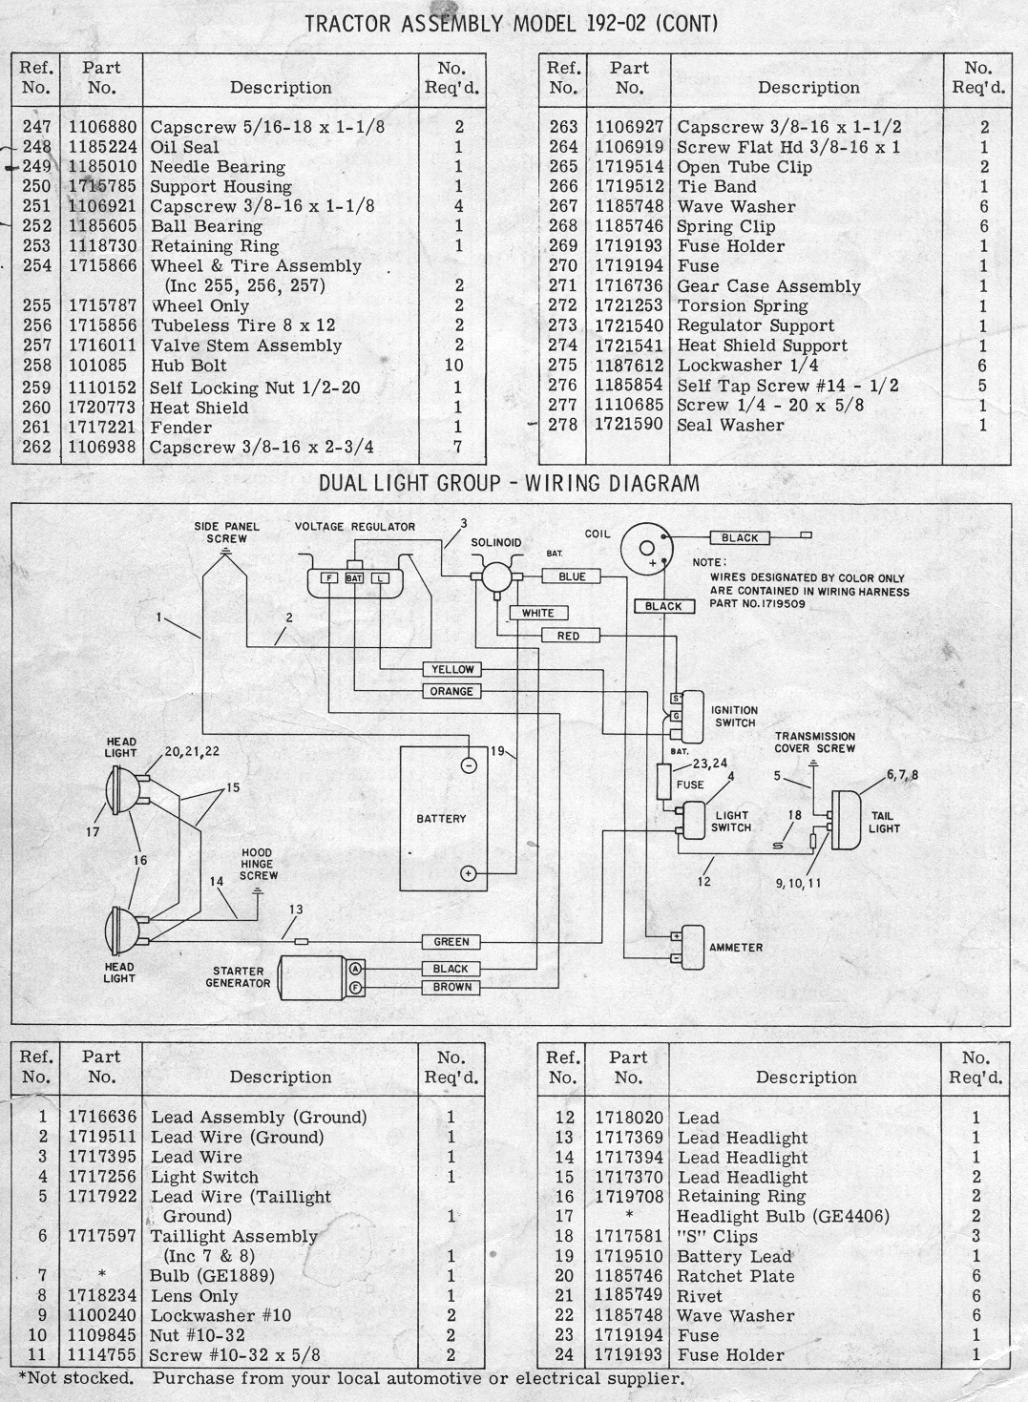 Cs 5557 John Deere 4020 24 Volt Wiring Diagram Free Picture Free Diagram